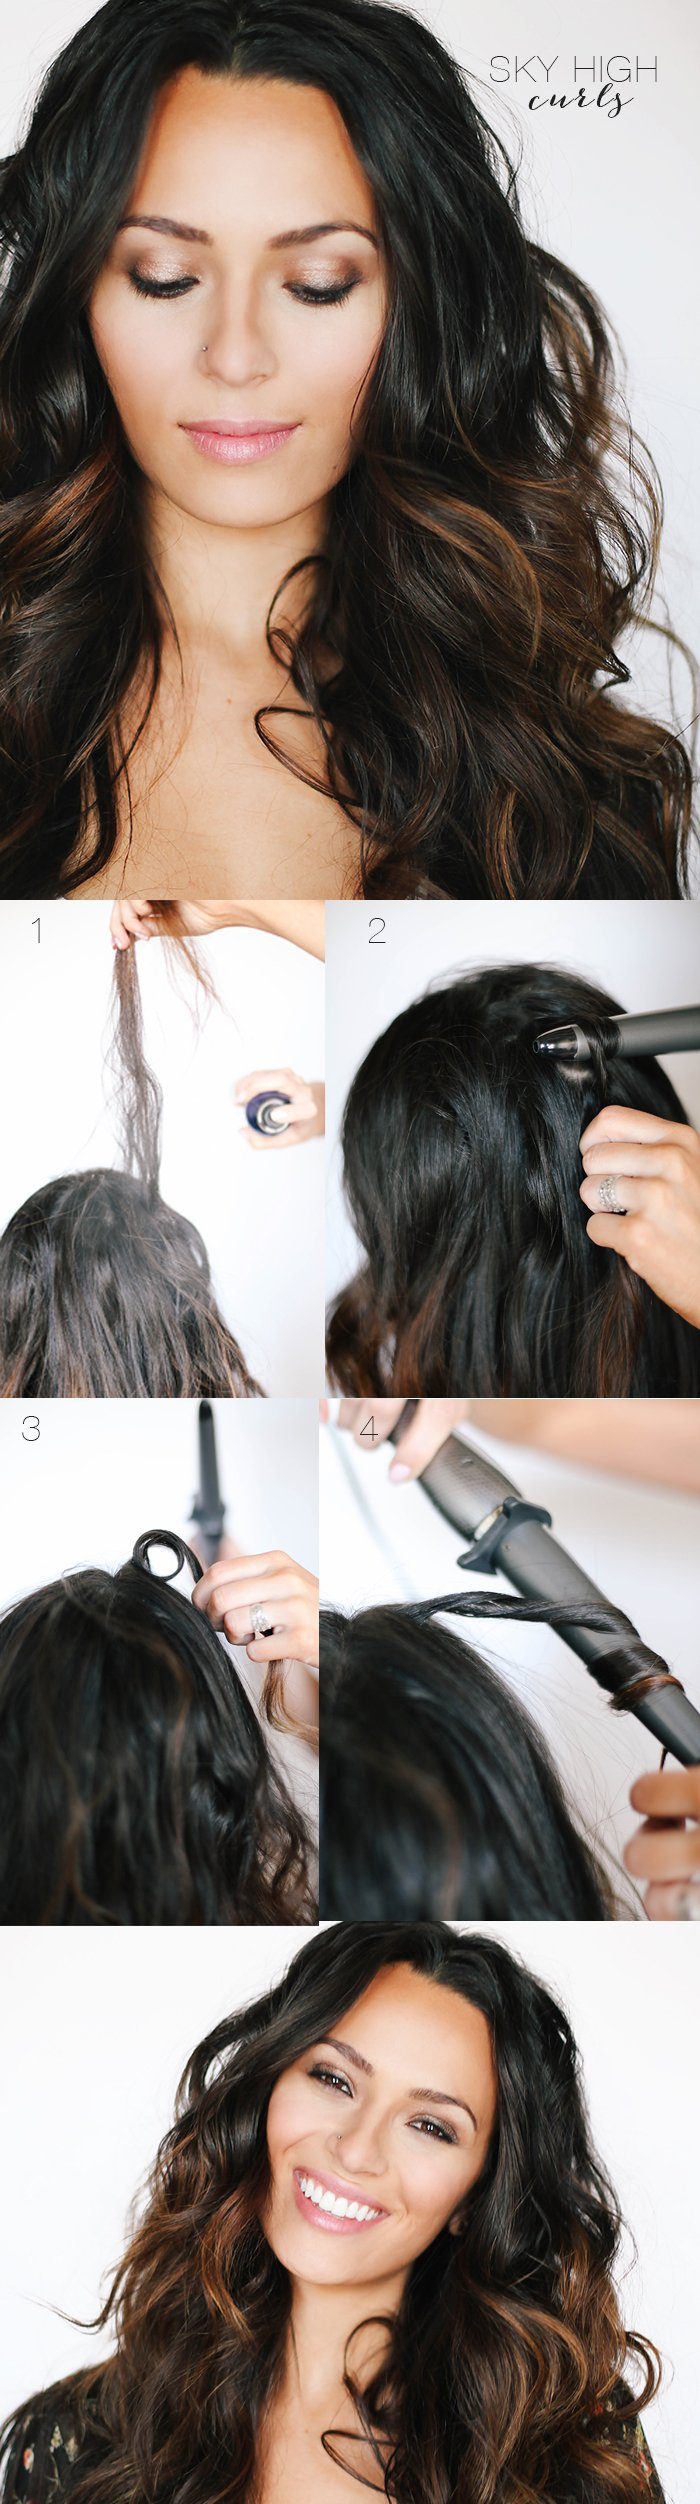 Как сделать кудри без бигуди и плойки фото